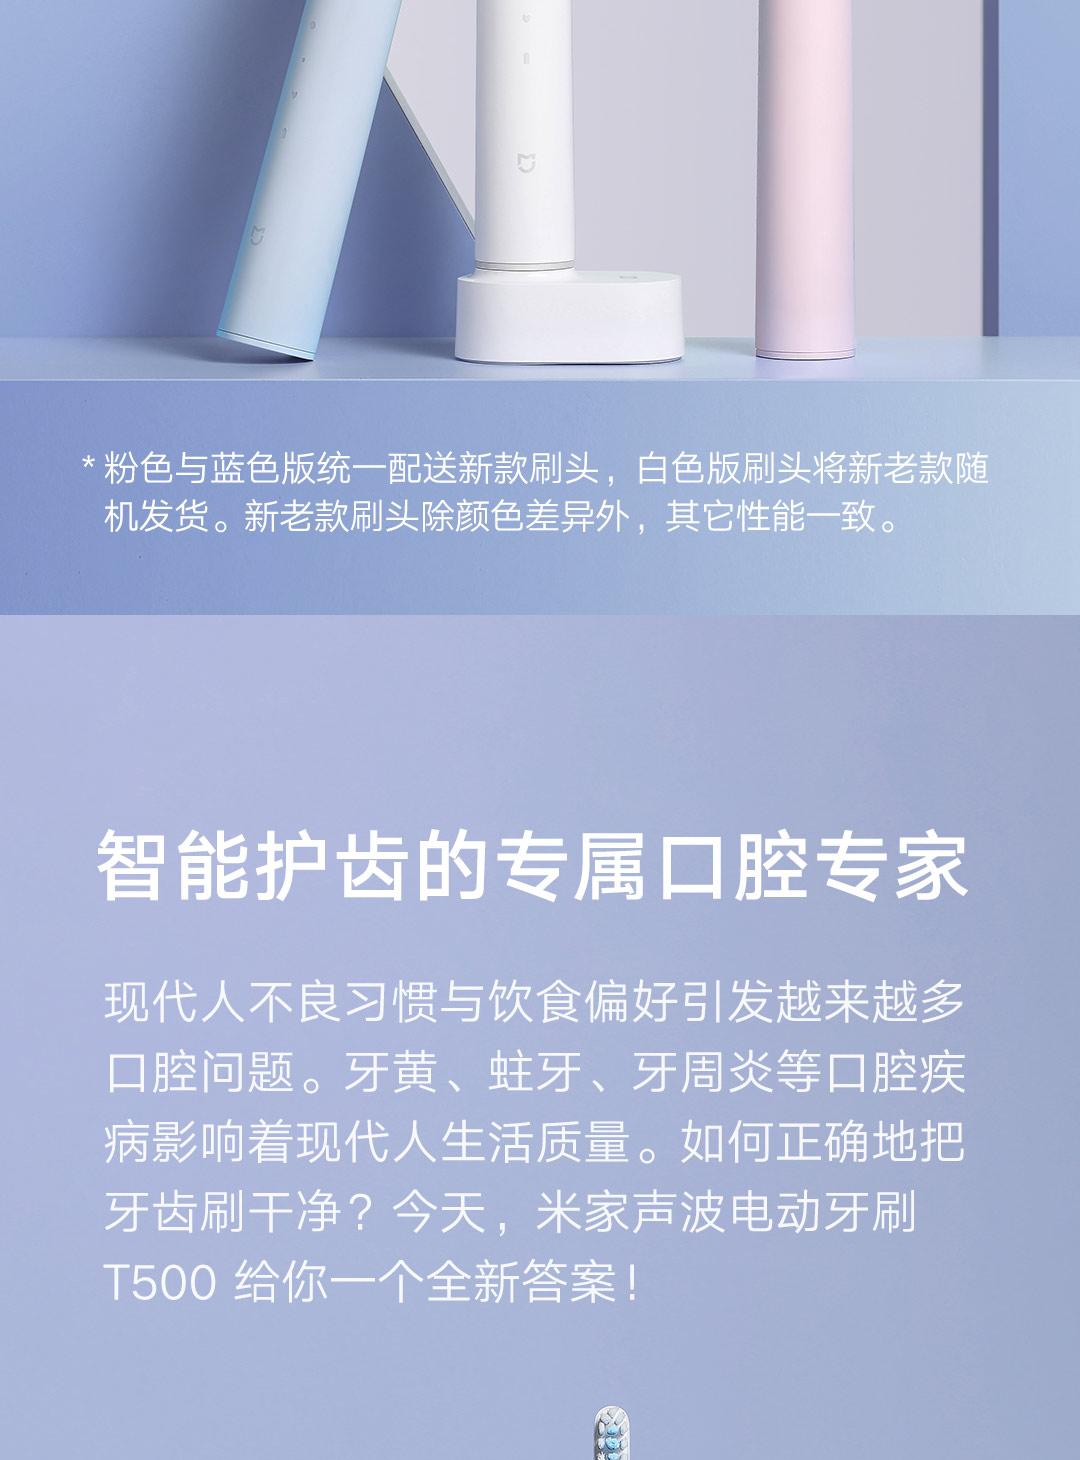 product_奇妙_米家声波电动牙刷T500